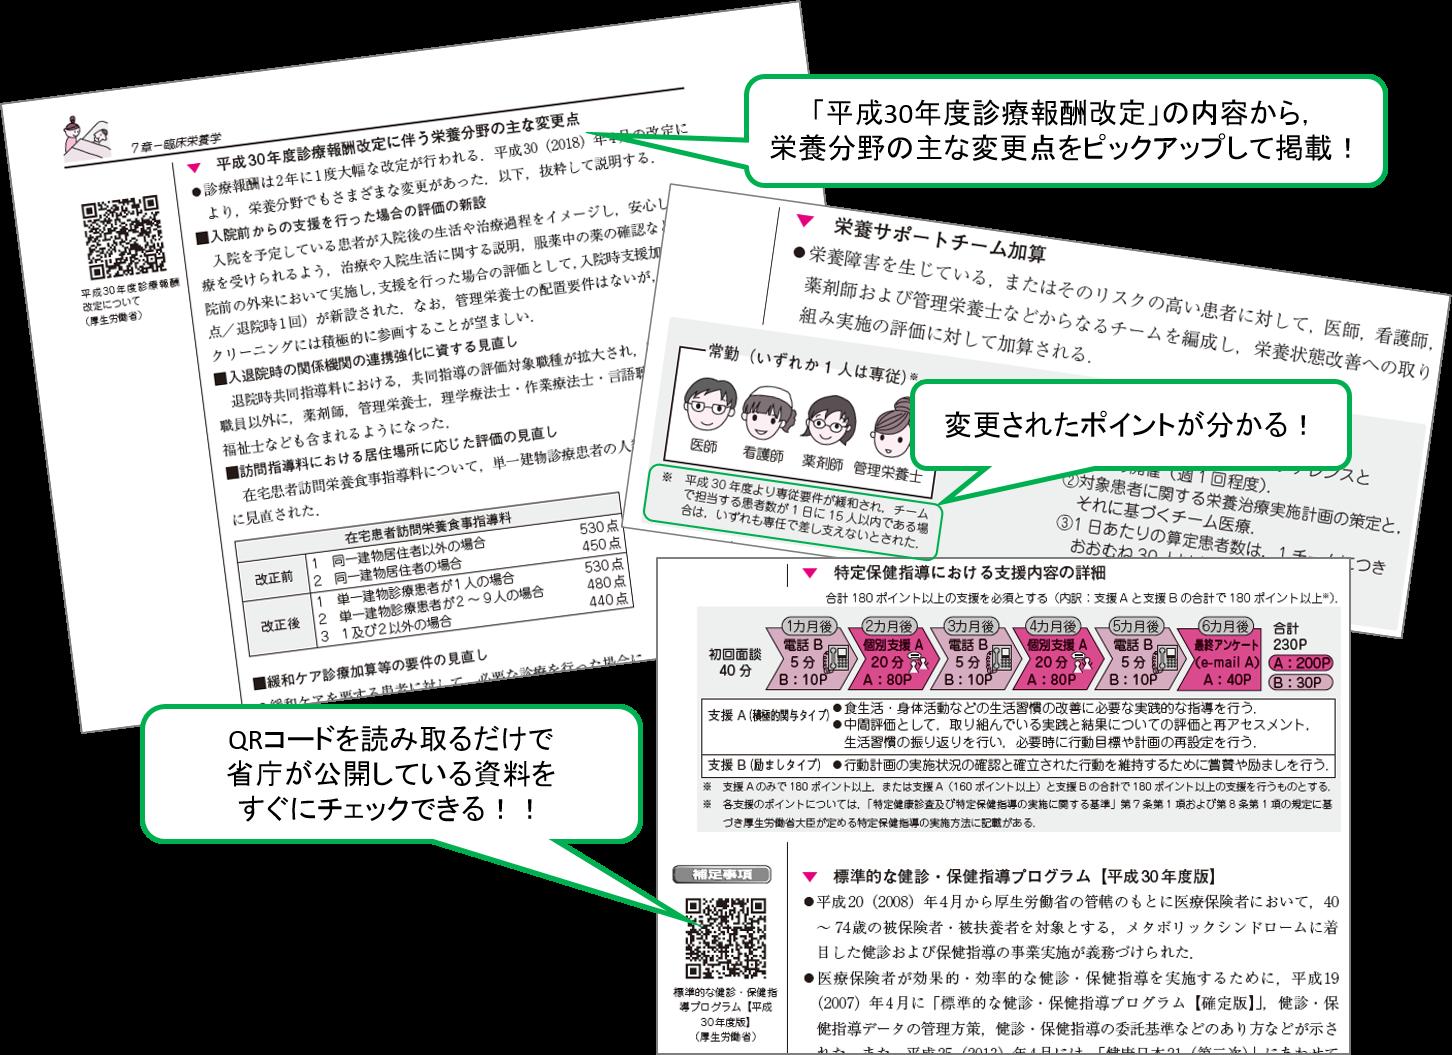 qb2019_point_情報アップデート.png